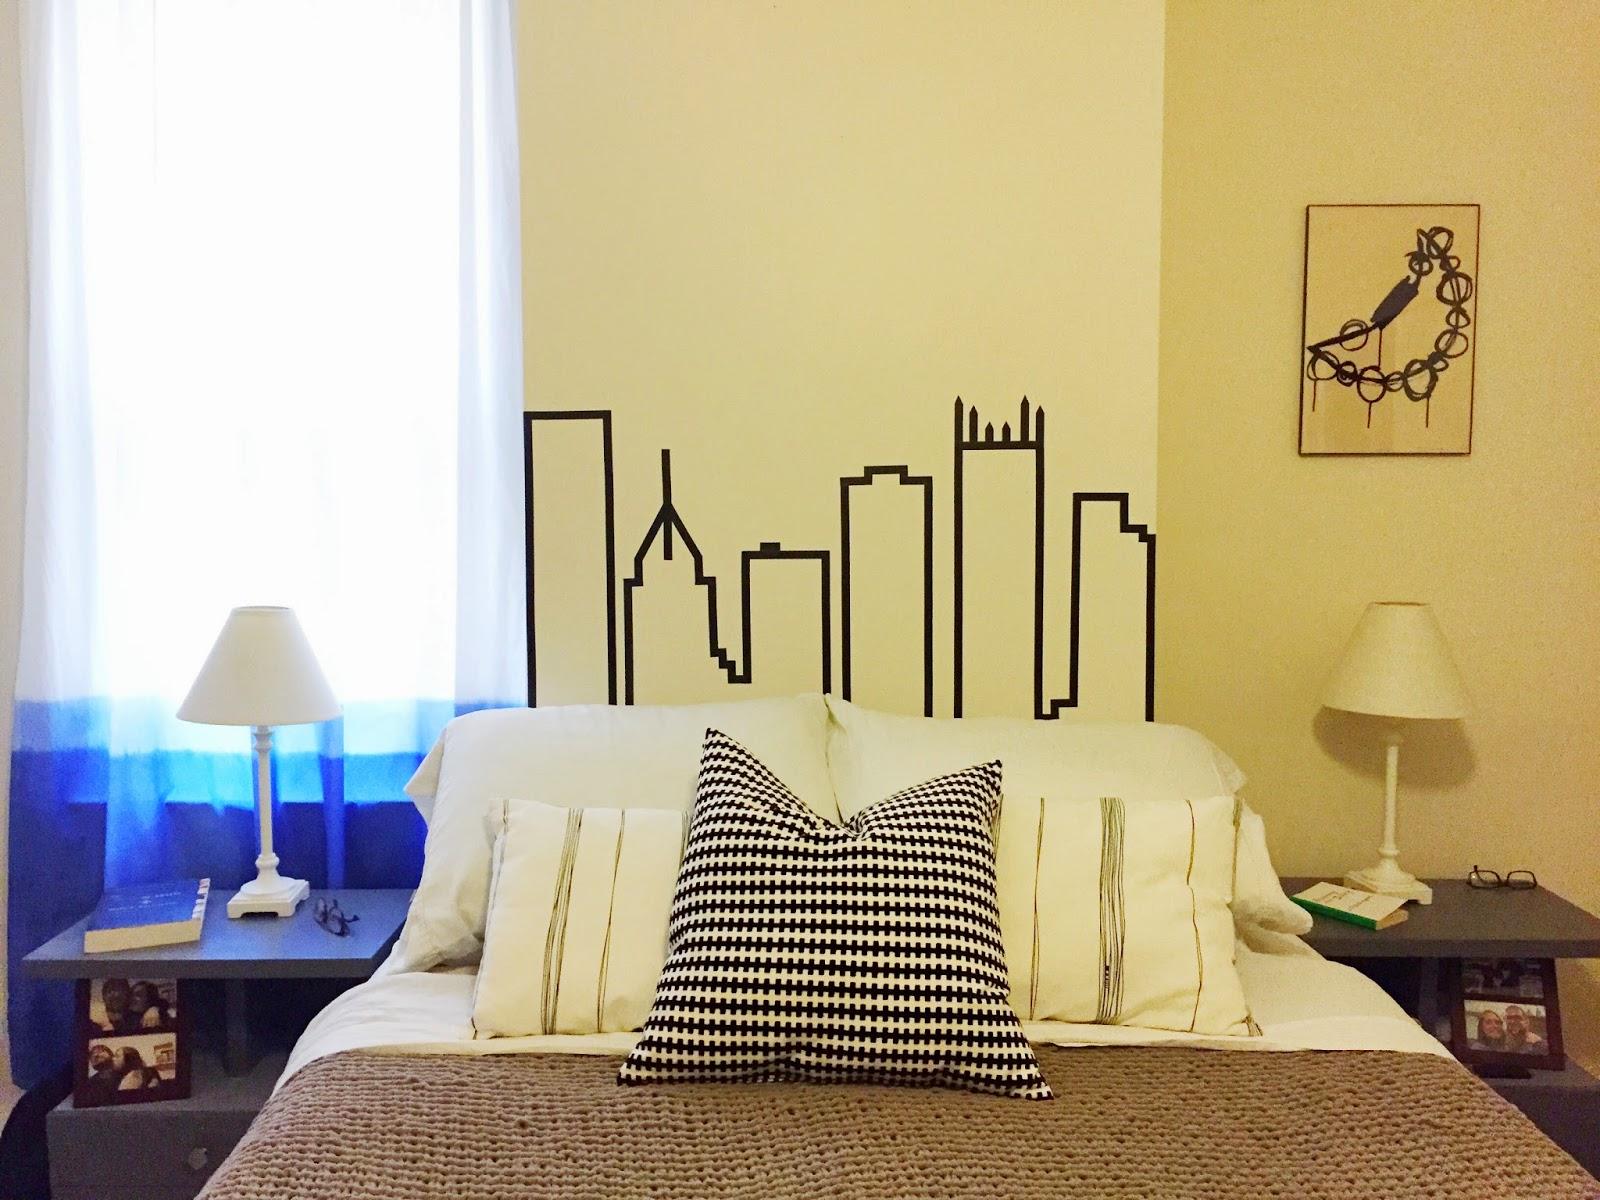 washi tape bedroom | Functionalities.net